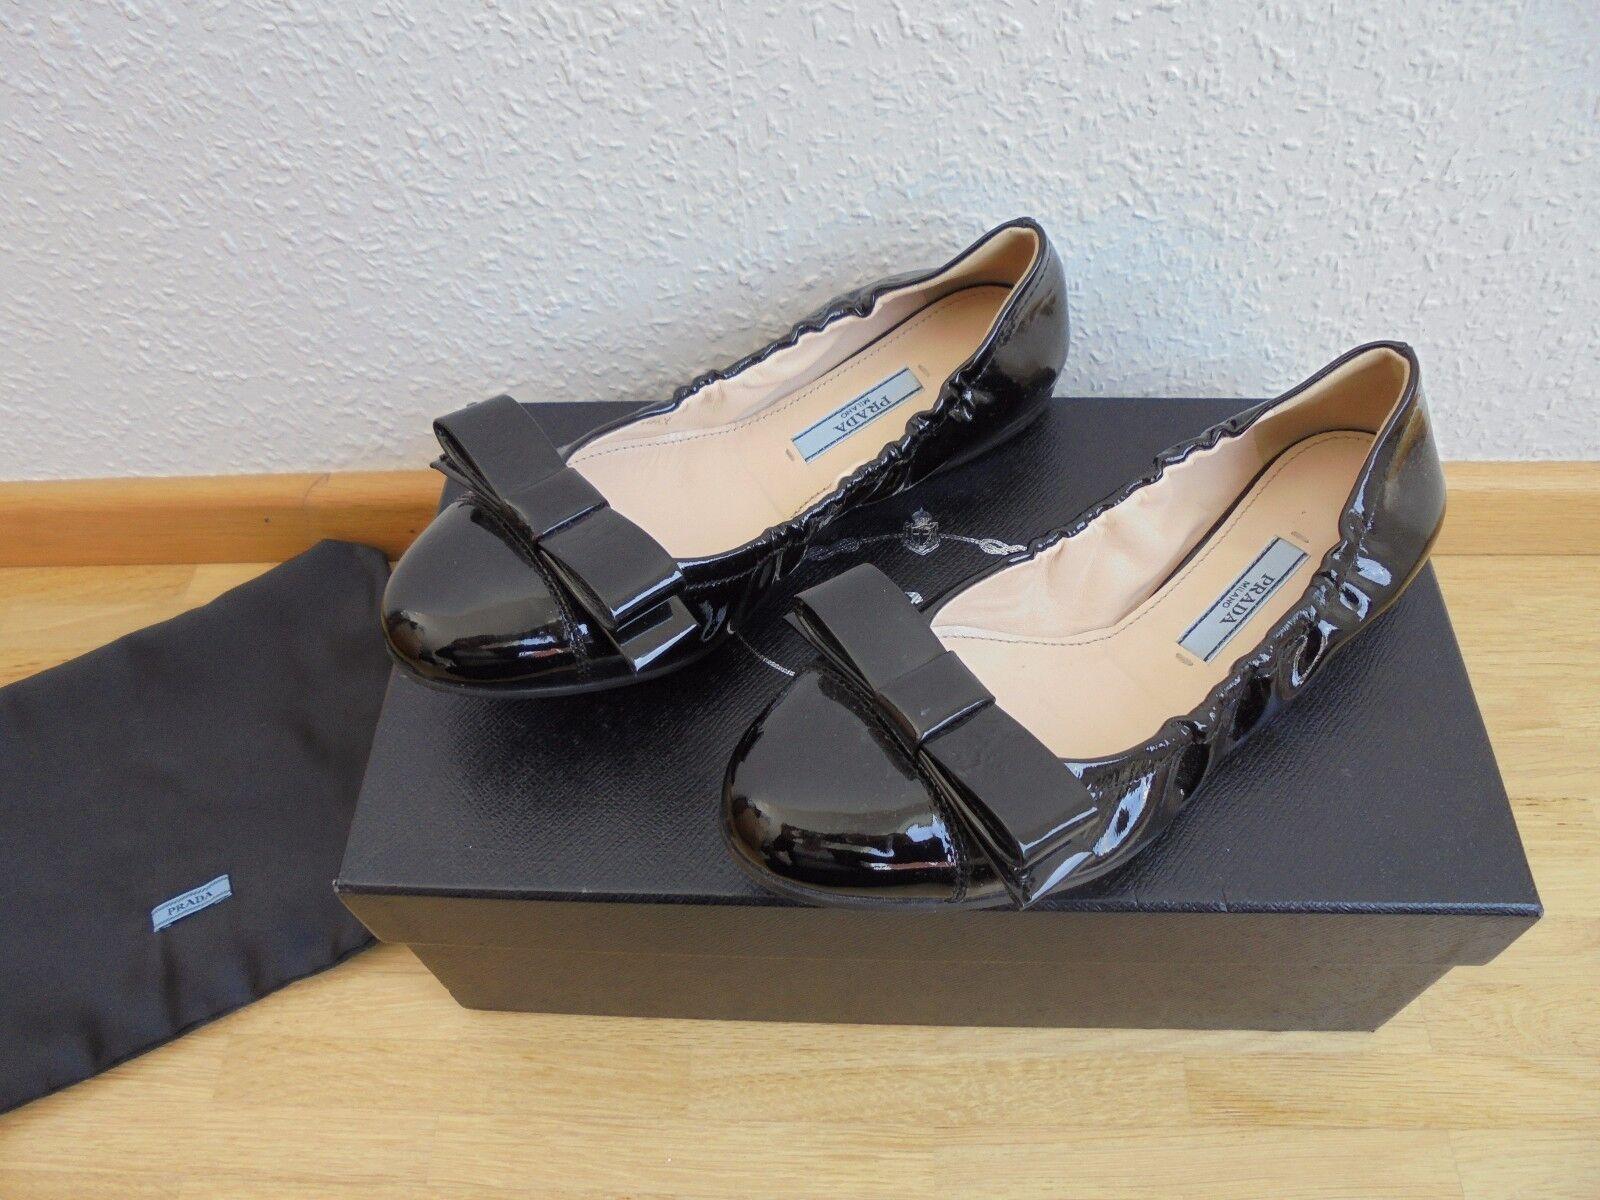 Prada Lackleder Ballerinas UVP 549 Schuhe Tasche Pumps Mokassins Gr. 35 35,5 36